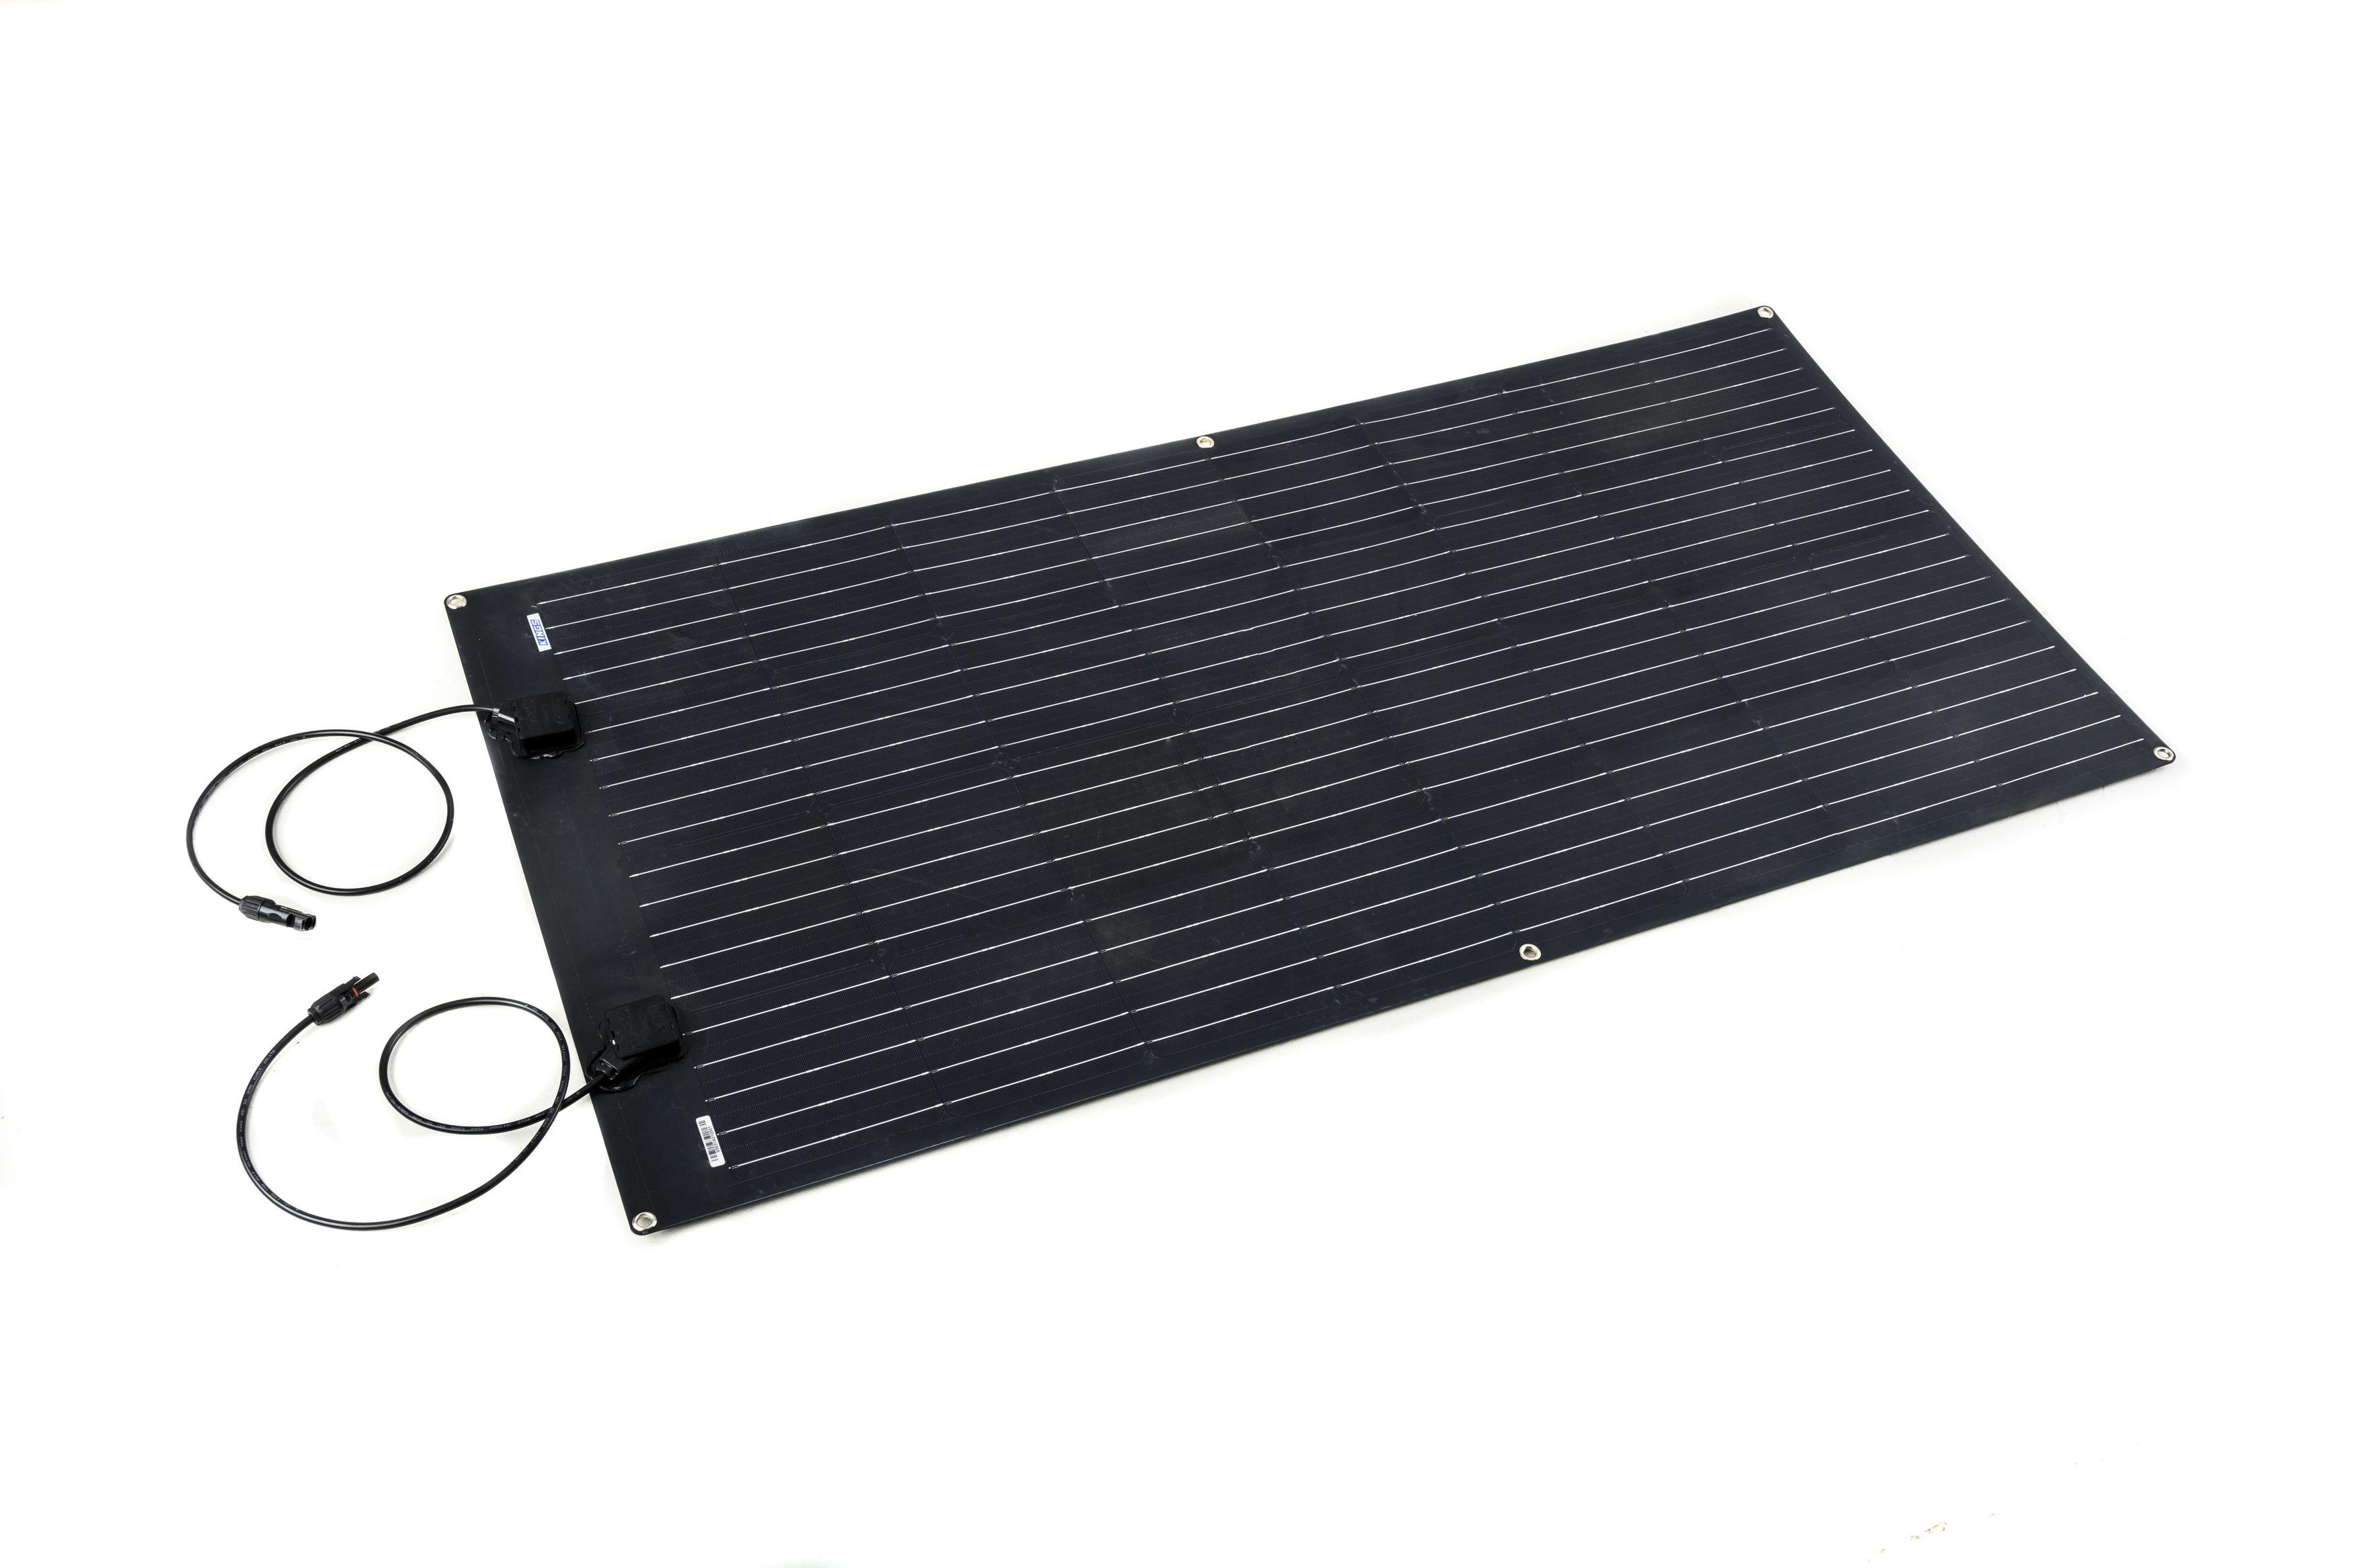 Kings 160W Semi-Flexible Solar Panel   PET construction   Monocrystalline   IP67 Rated